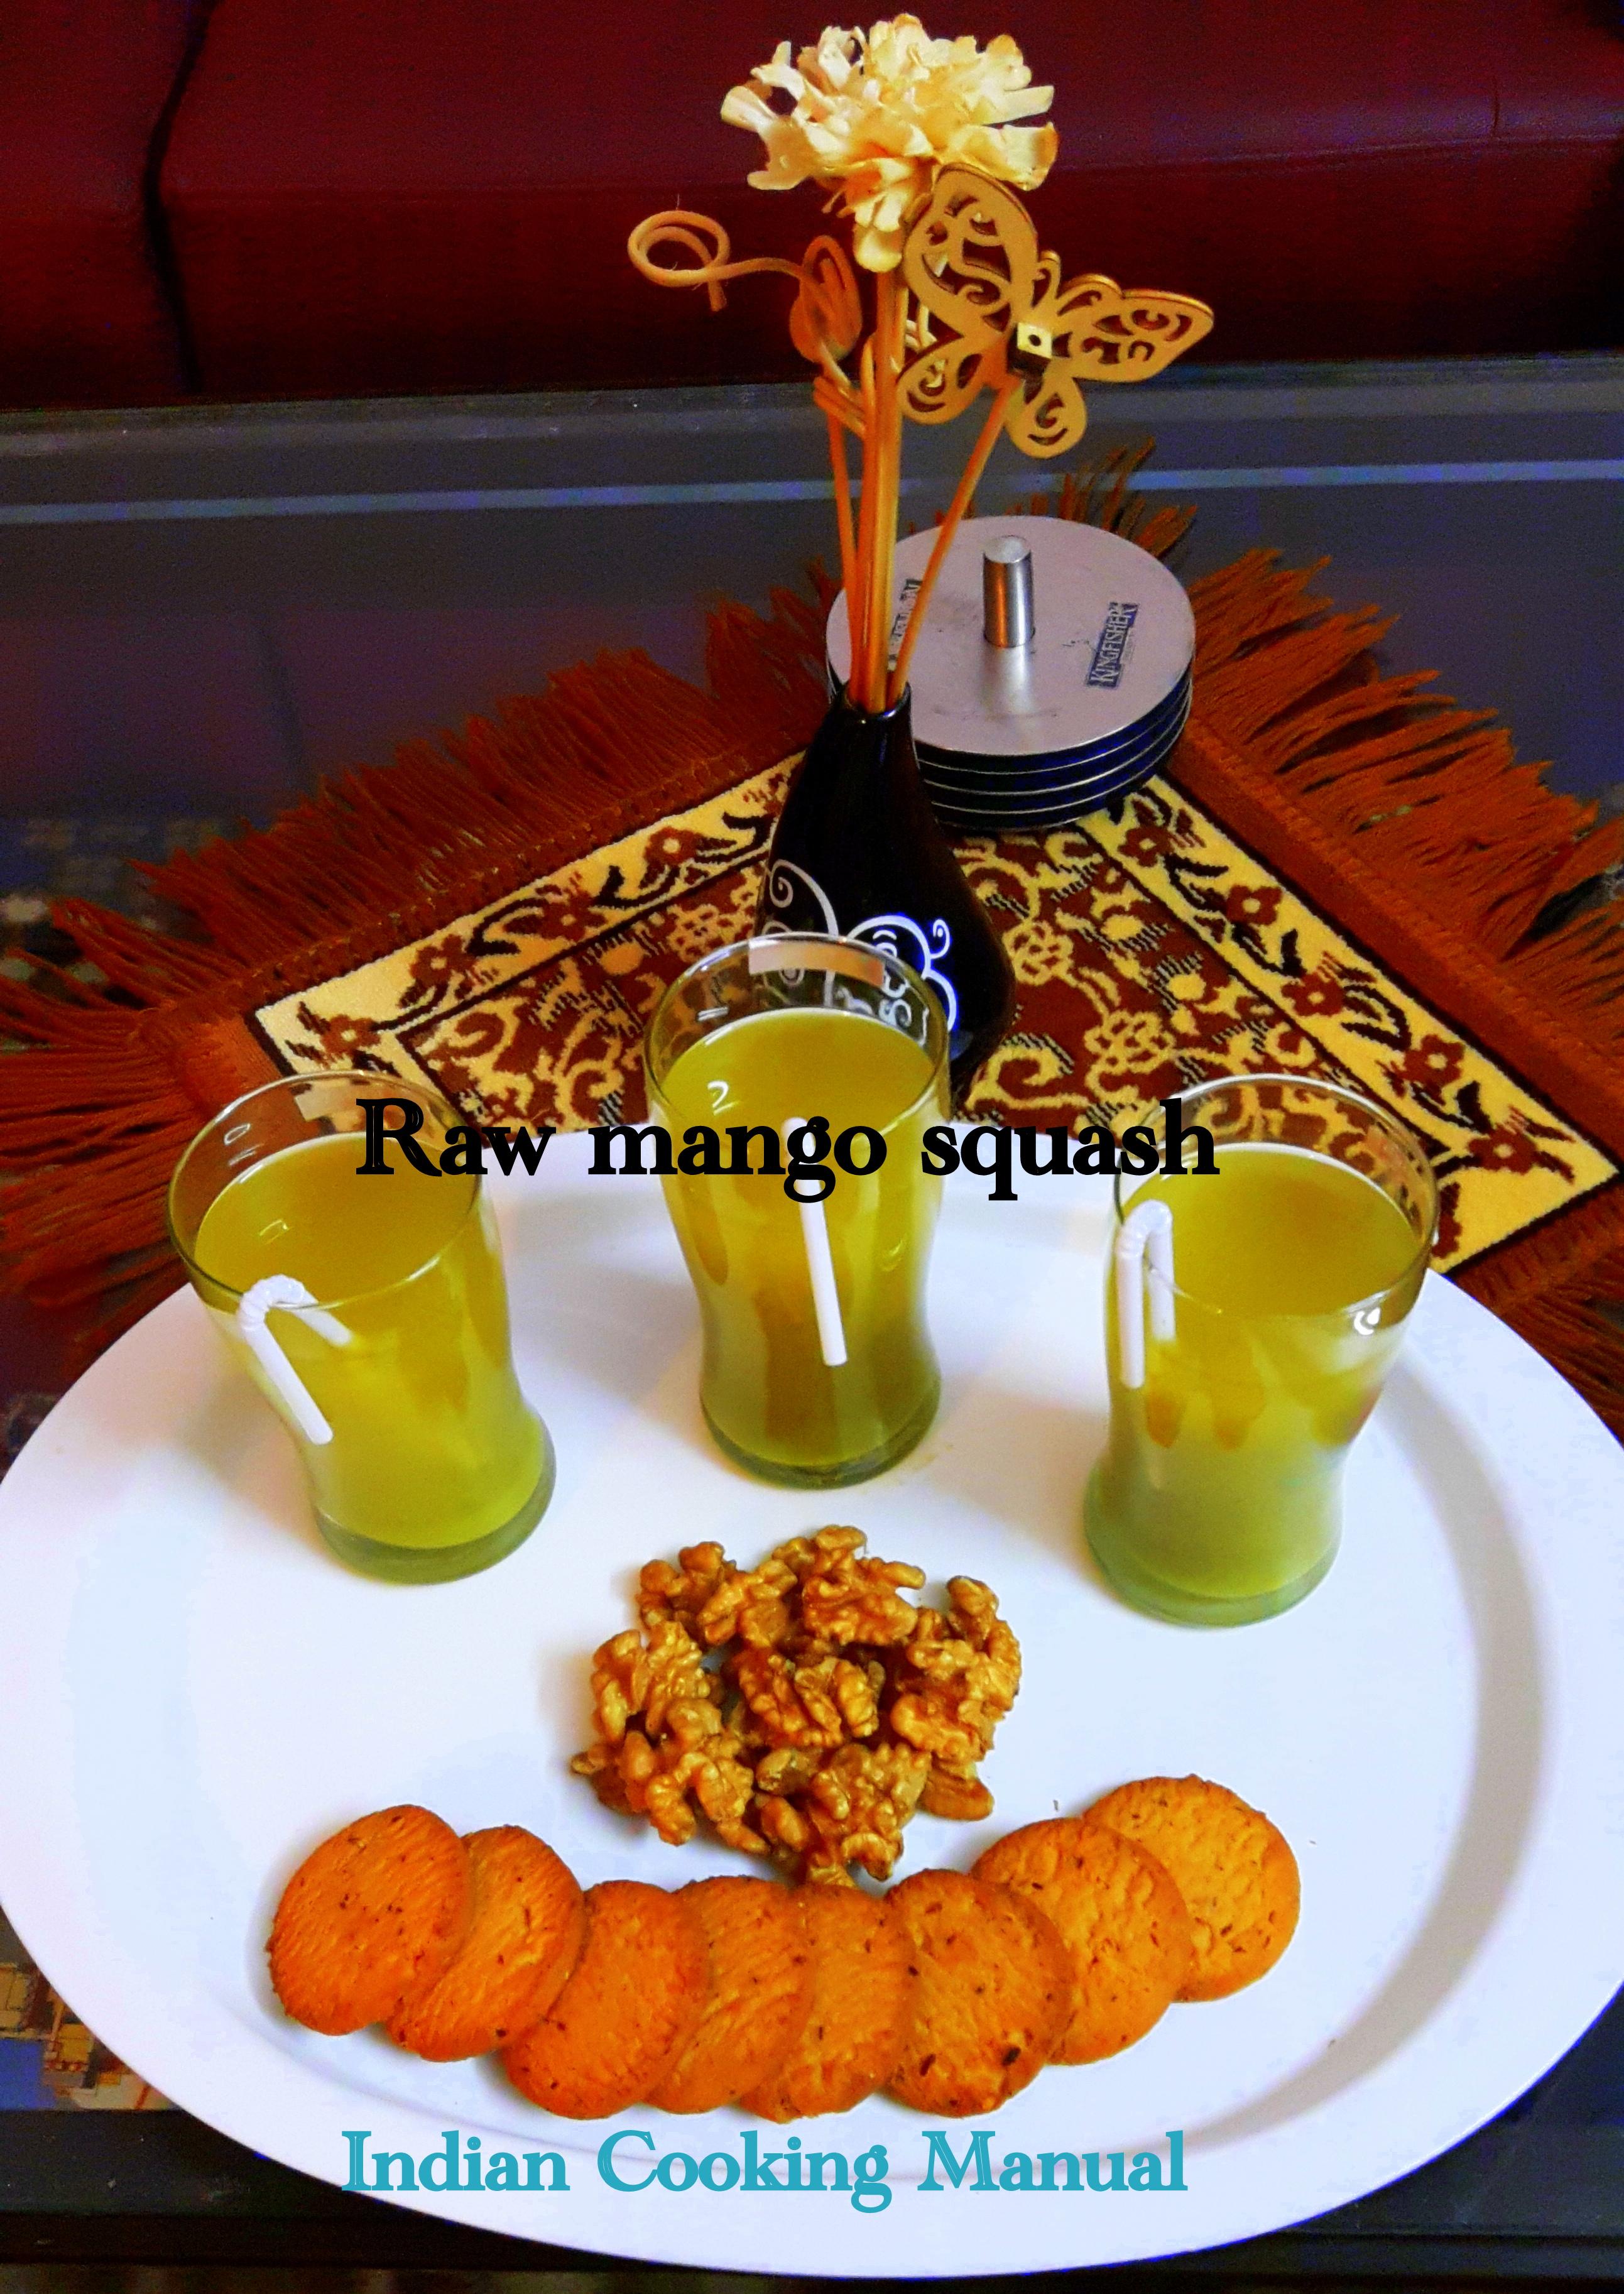 Raw mango squash